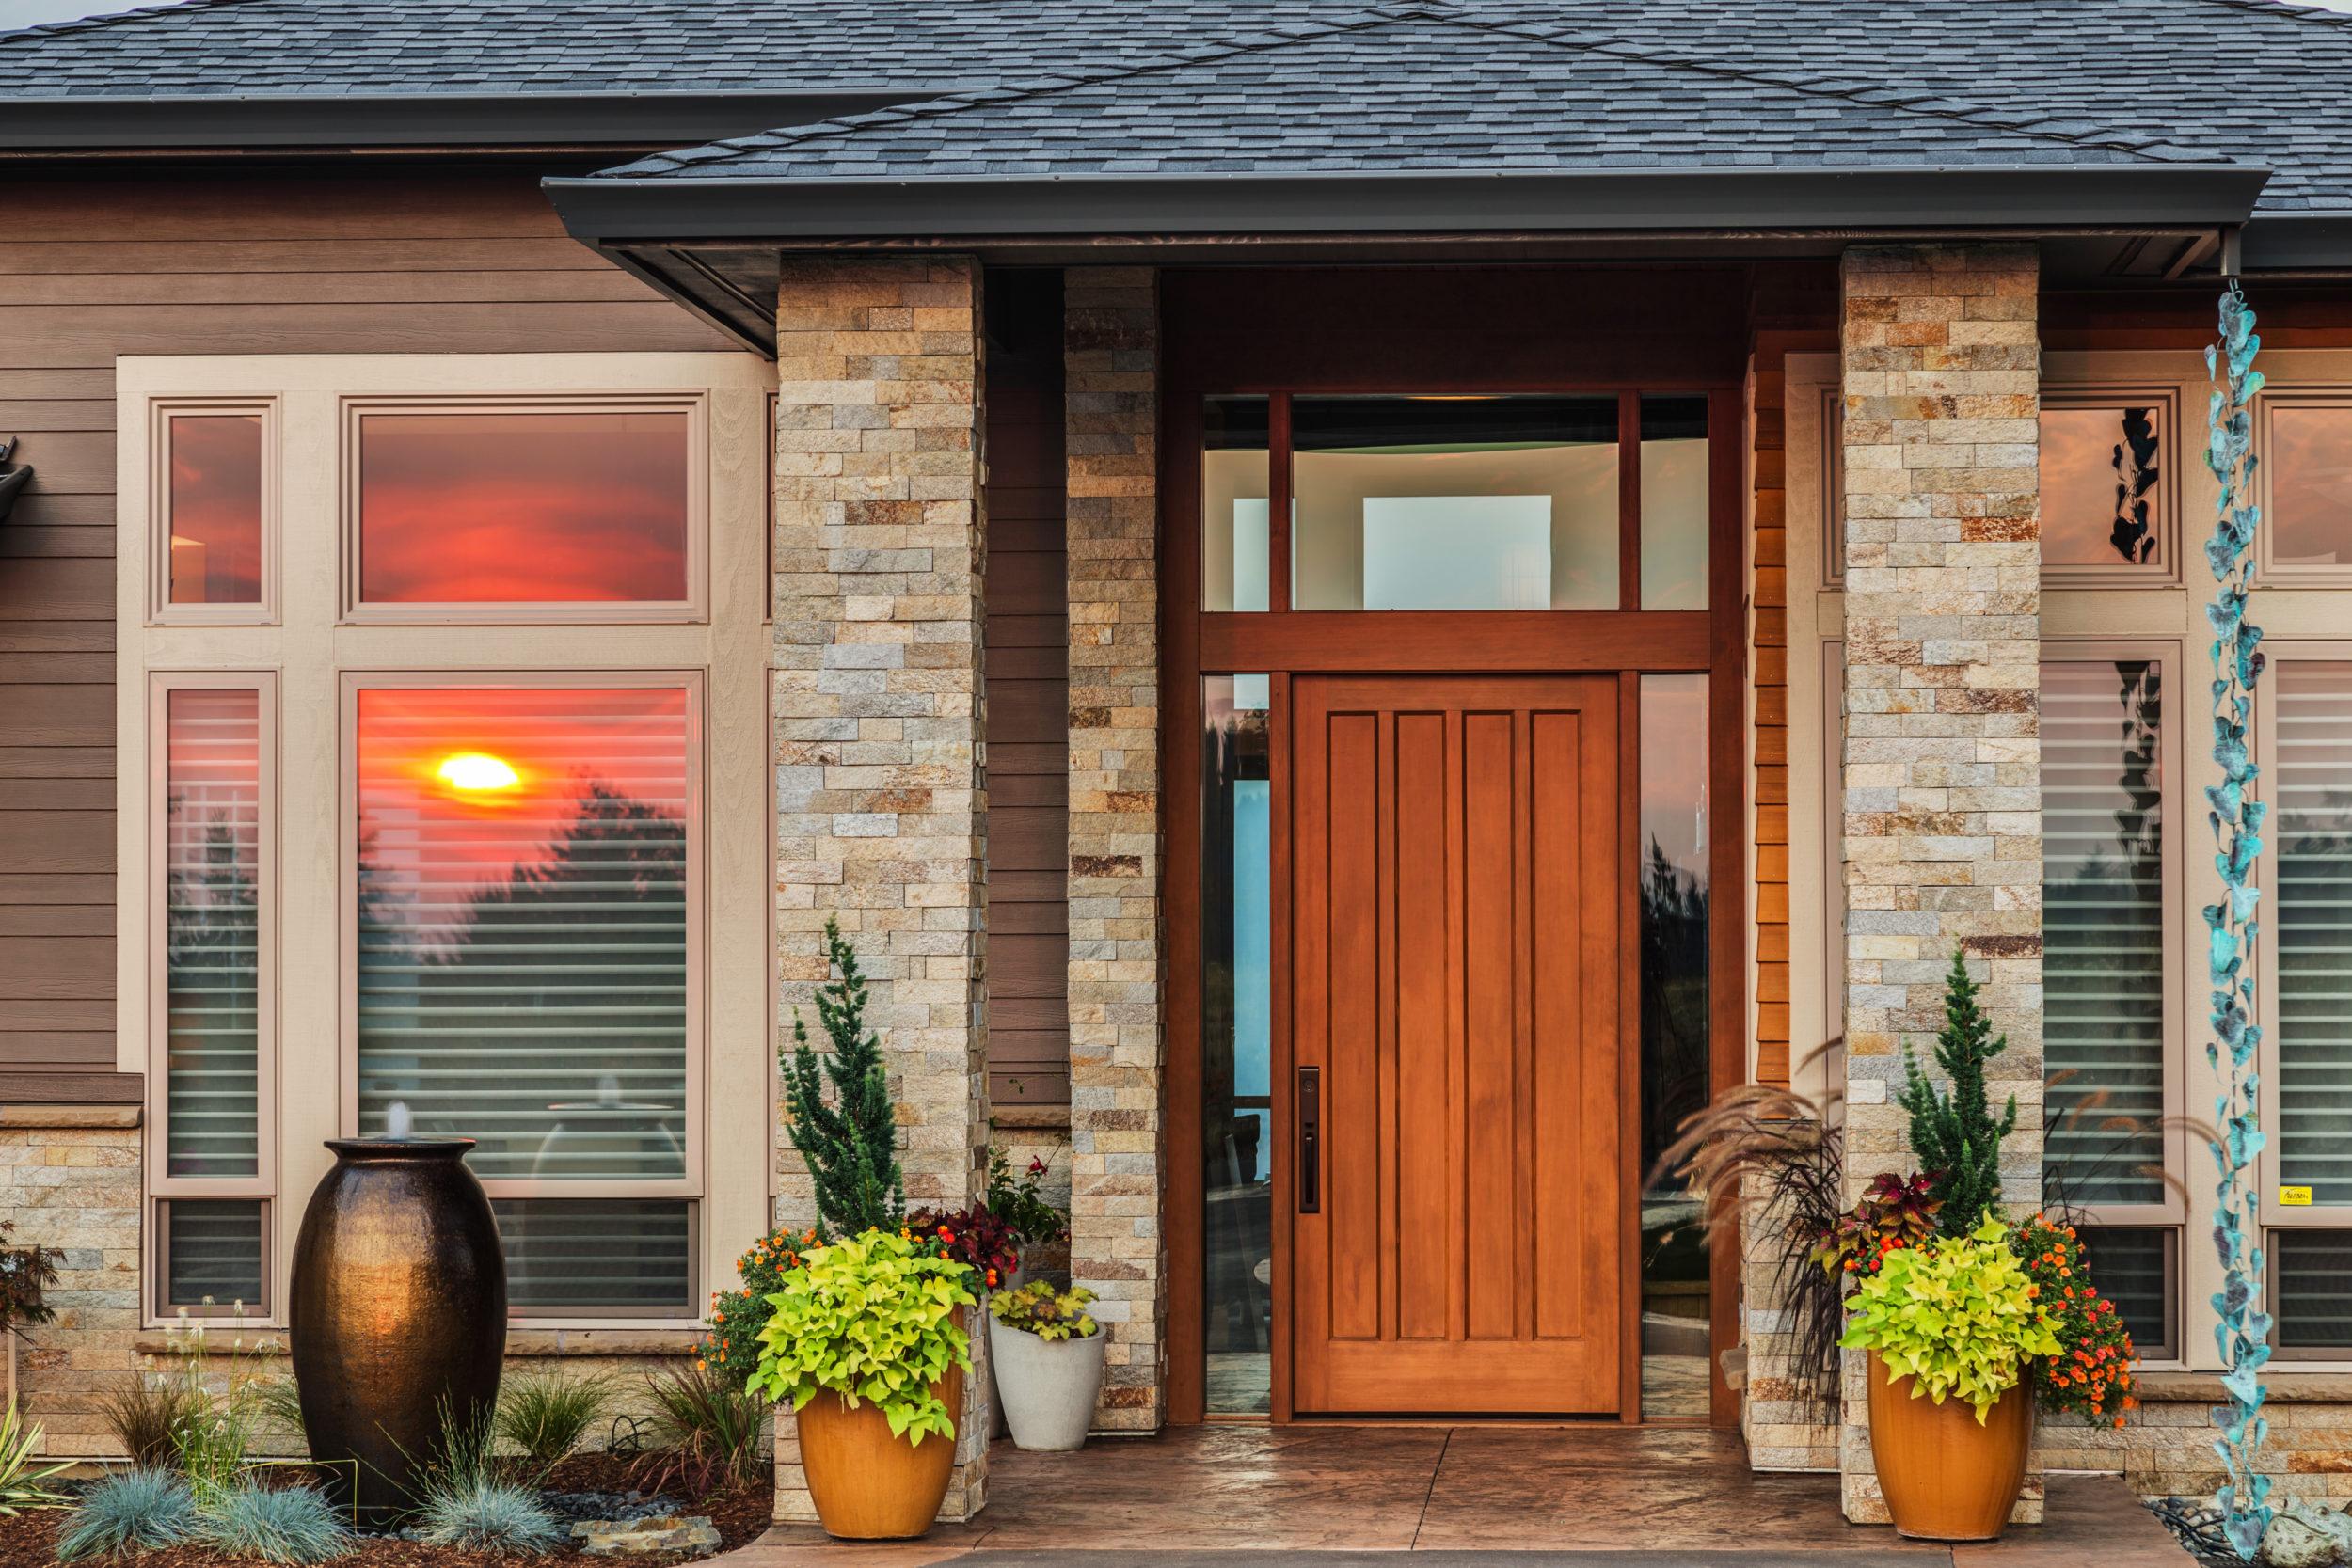 phoenix homes, arizona homes, arizona realtor, buy a house, roberta candelaria, phoenix urban spaces